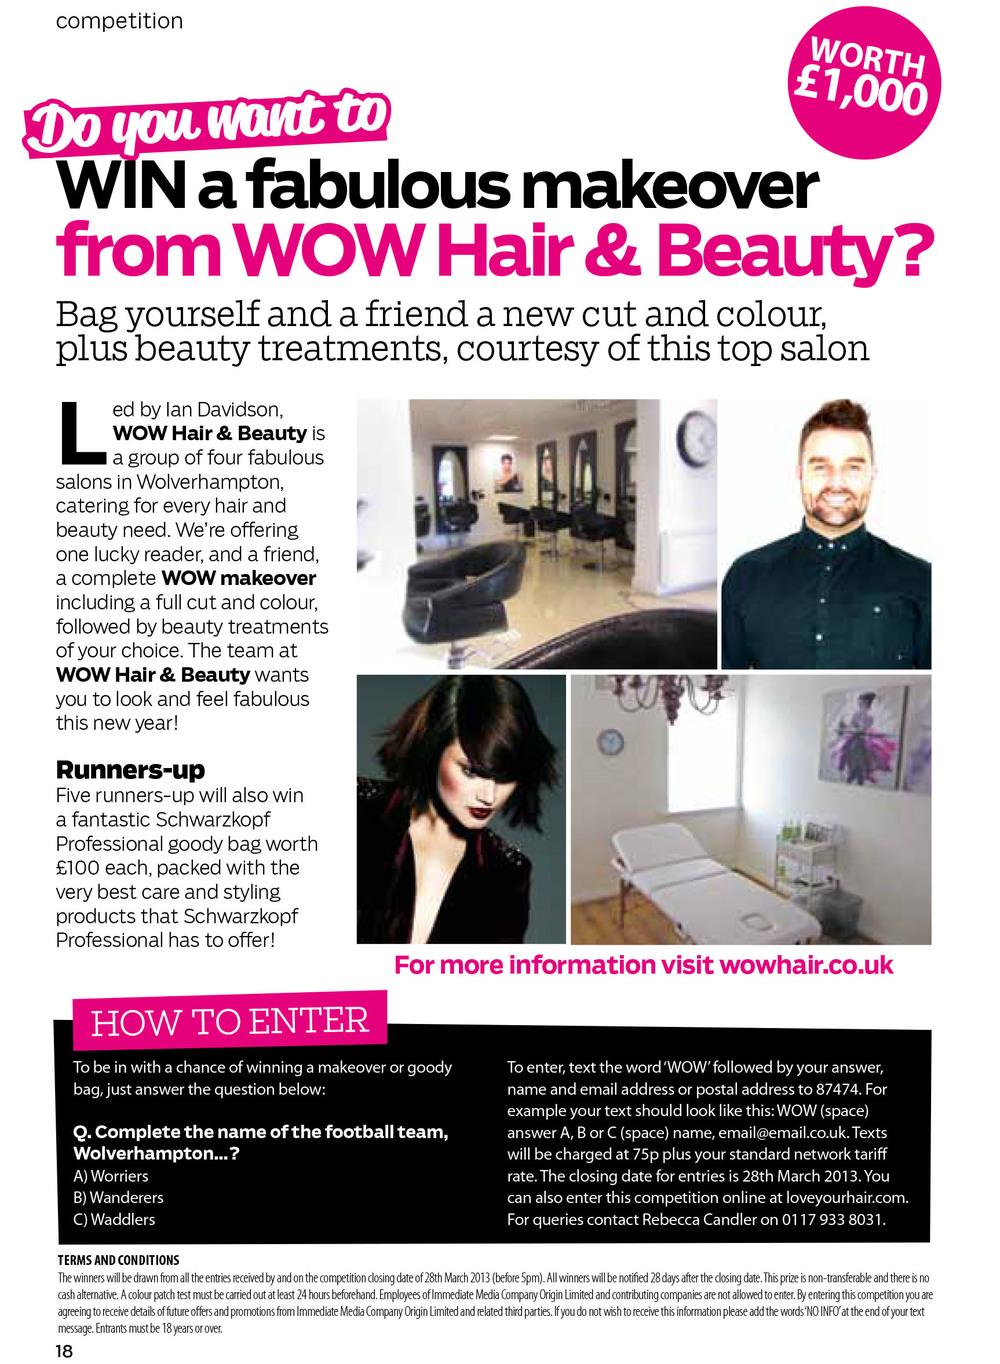 Hair Ideas - March 2013 - WOW competition.jpg